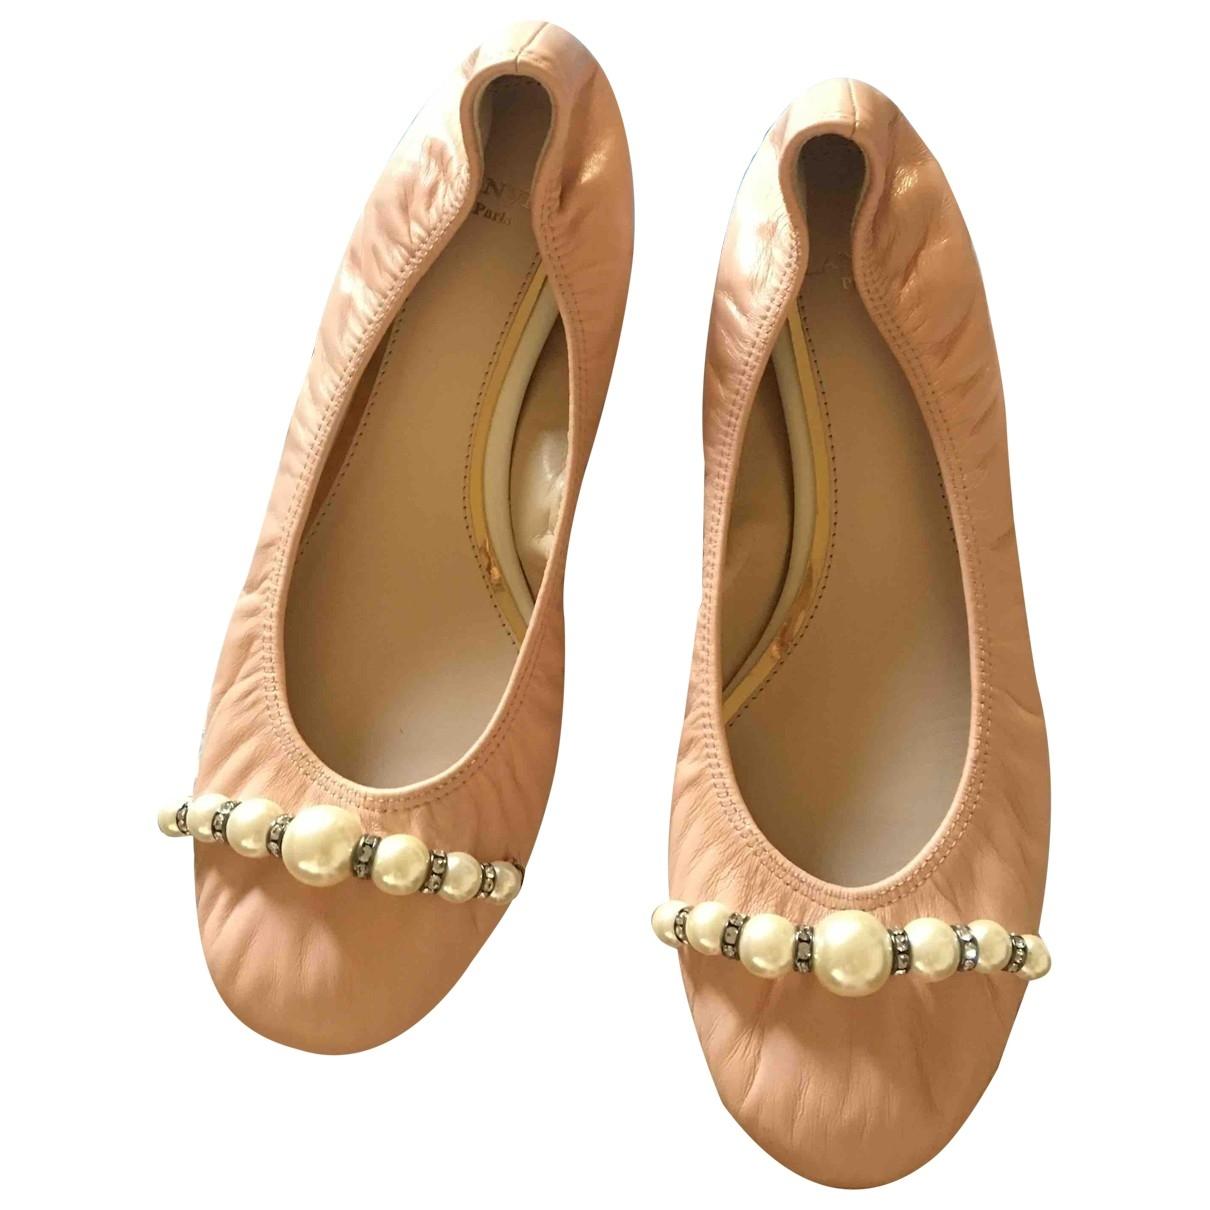 Lanvin \N Pink Leather Ballet flats for Women 36 EU